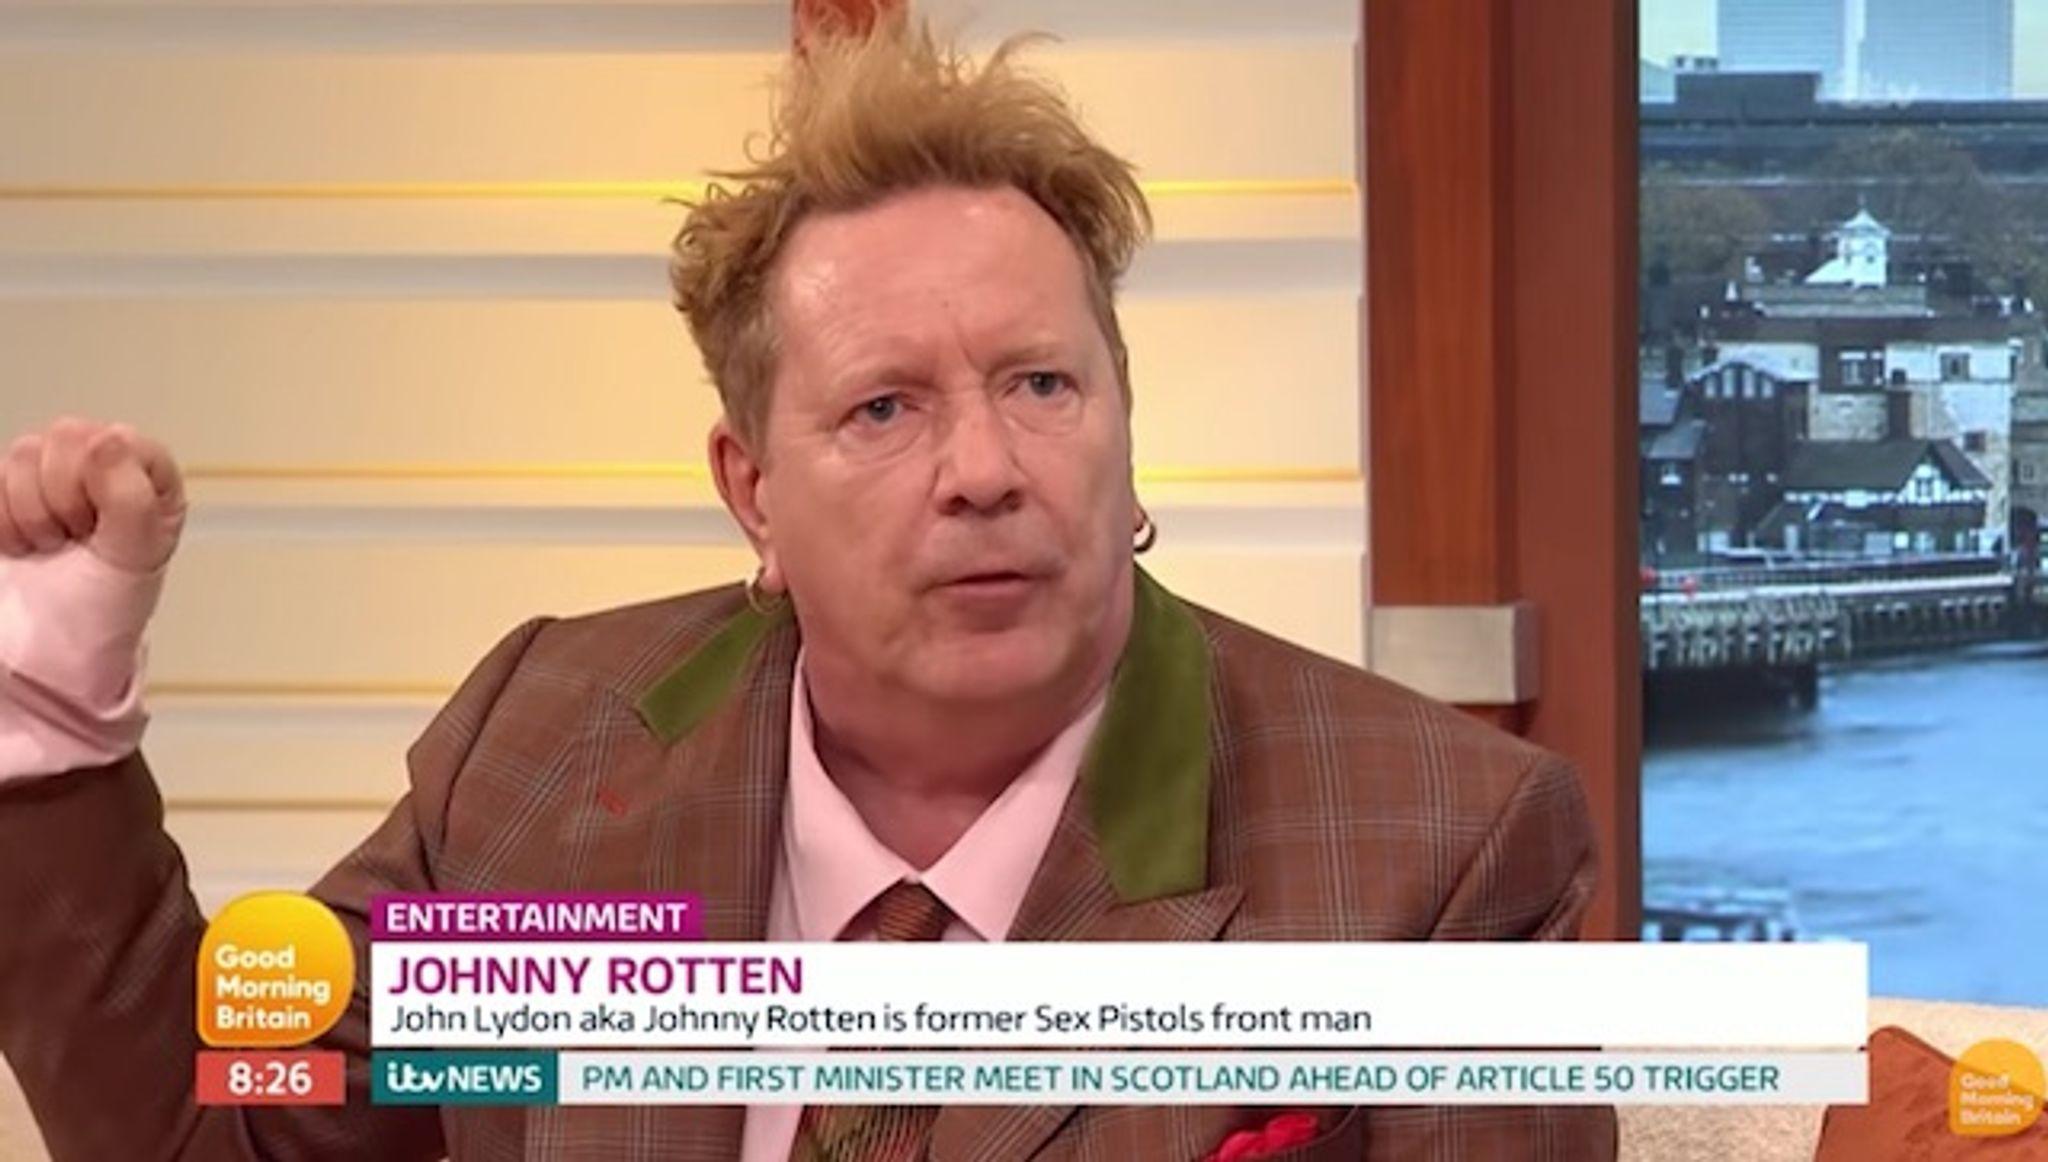 Johnny Rotten defends Donald Trump, slams 'left-wing media'